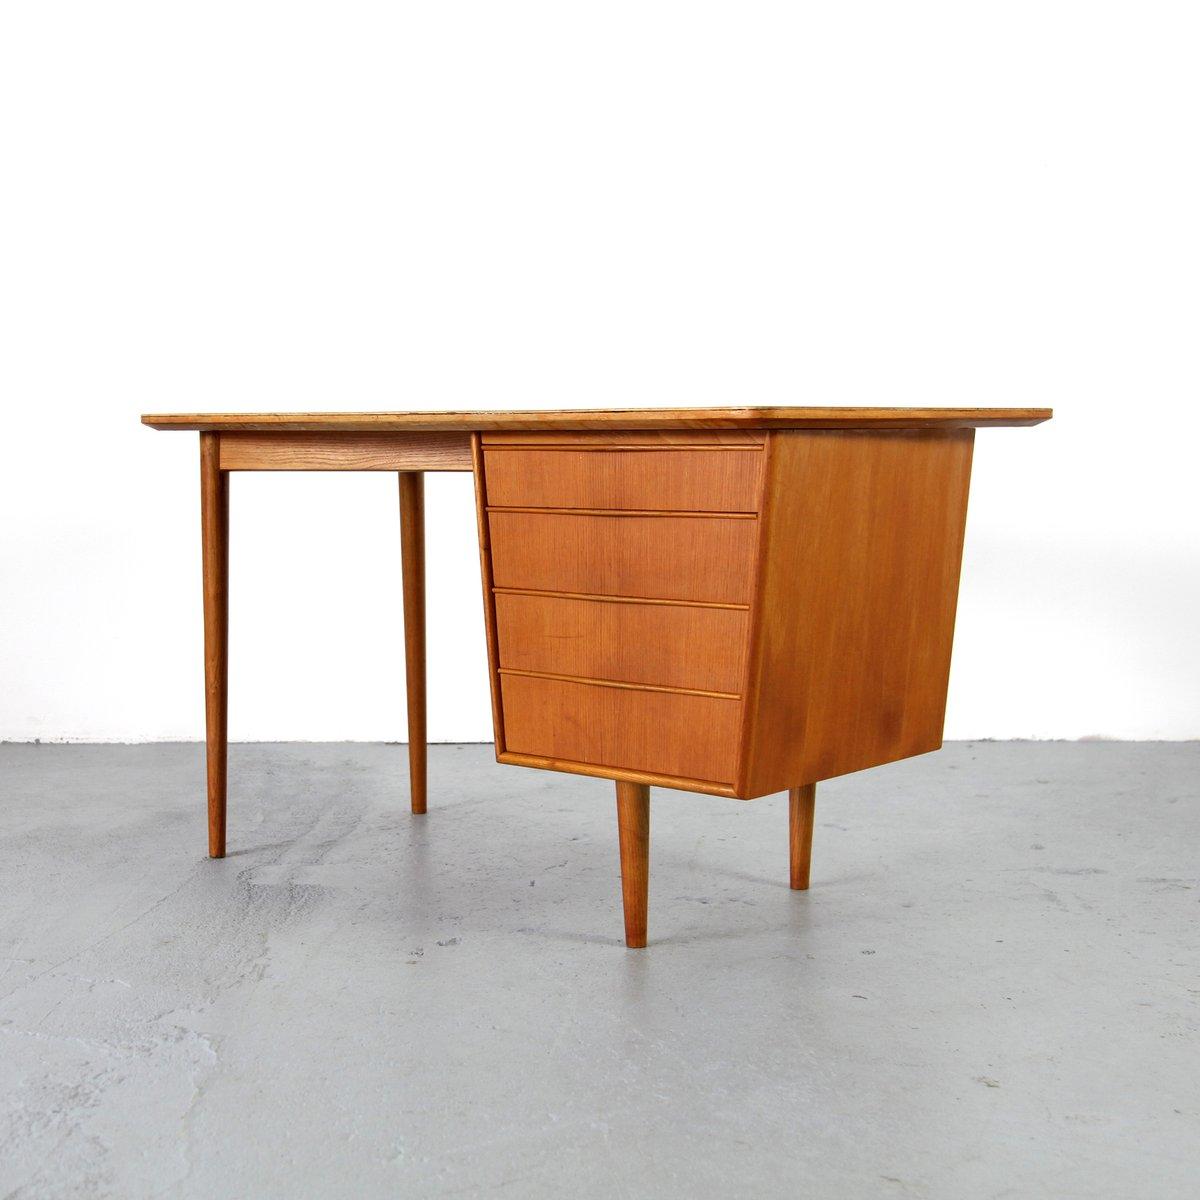 Mid Century Modern Desk: Small Mid-Century Modern Desk, 1950s For Sale At Pamono